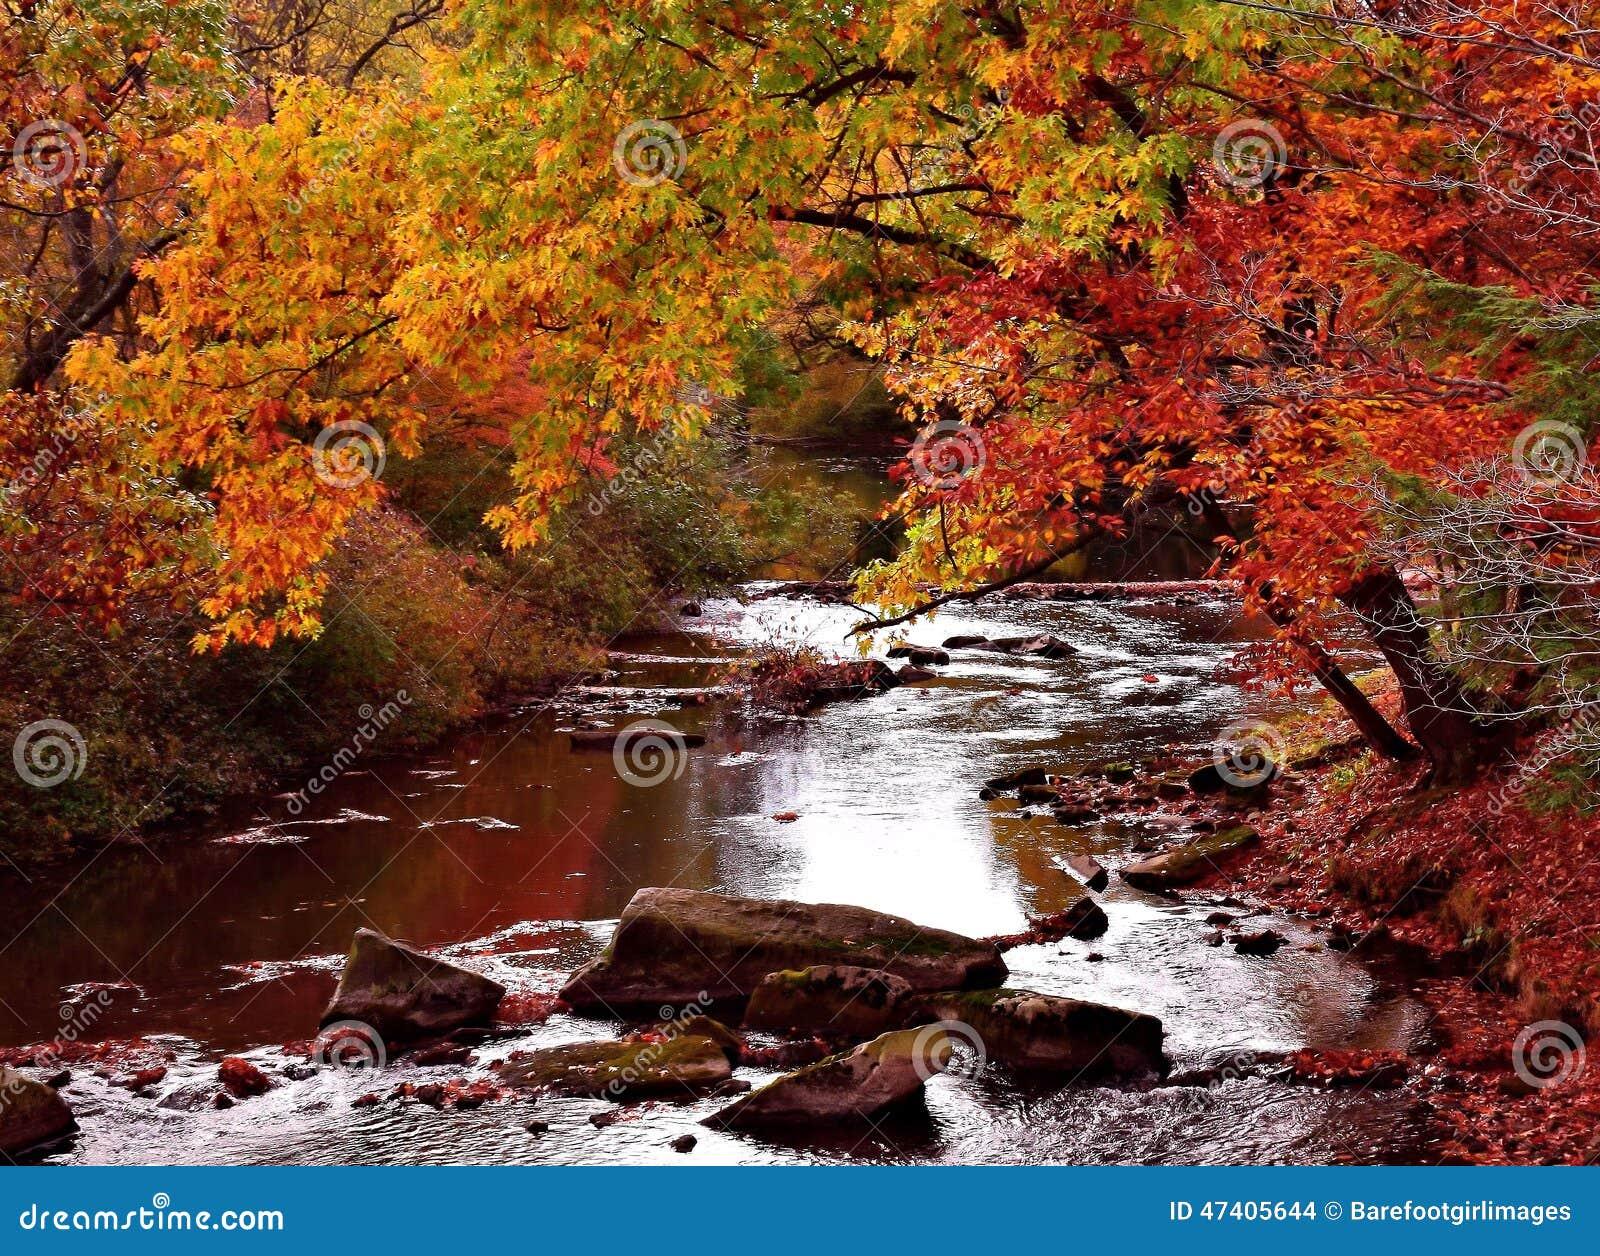 fall mountain stream stock photo image of nature tree 47405644